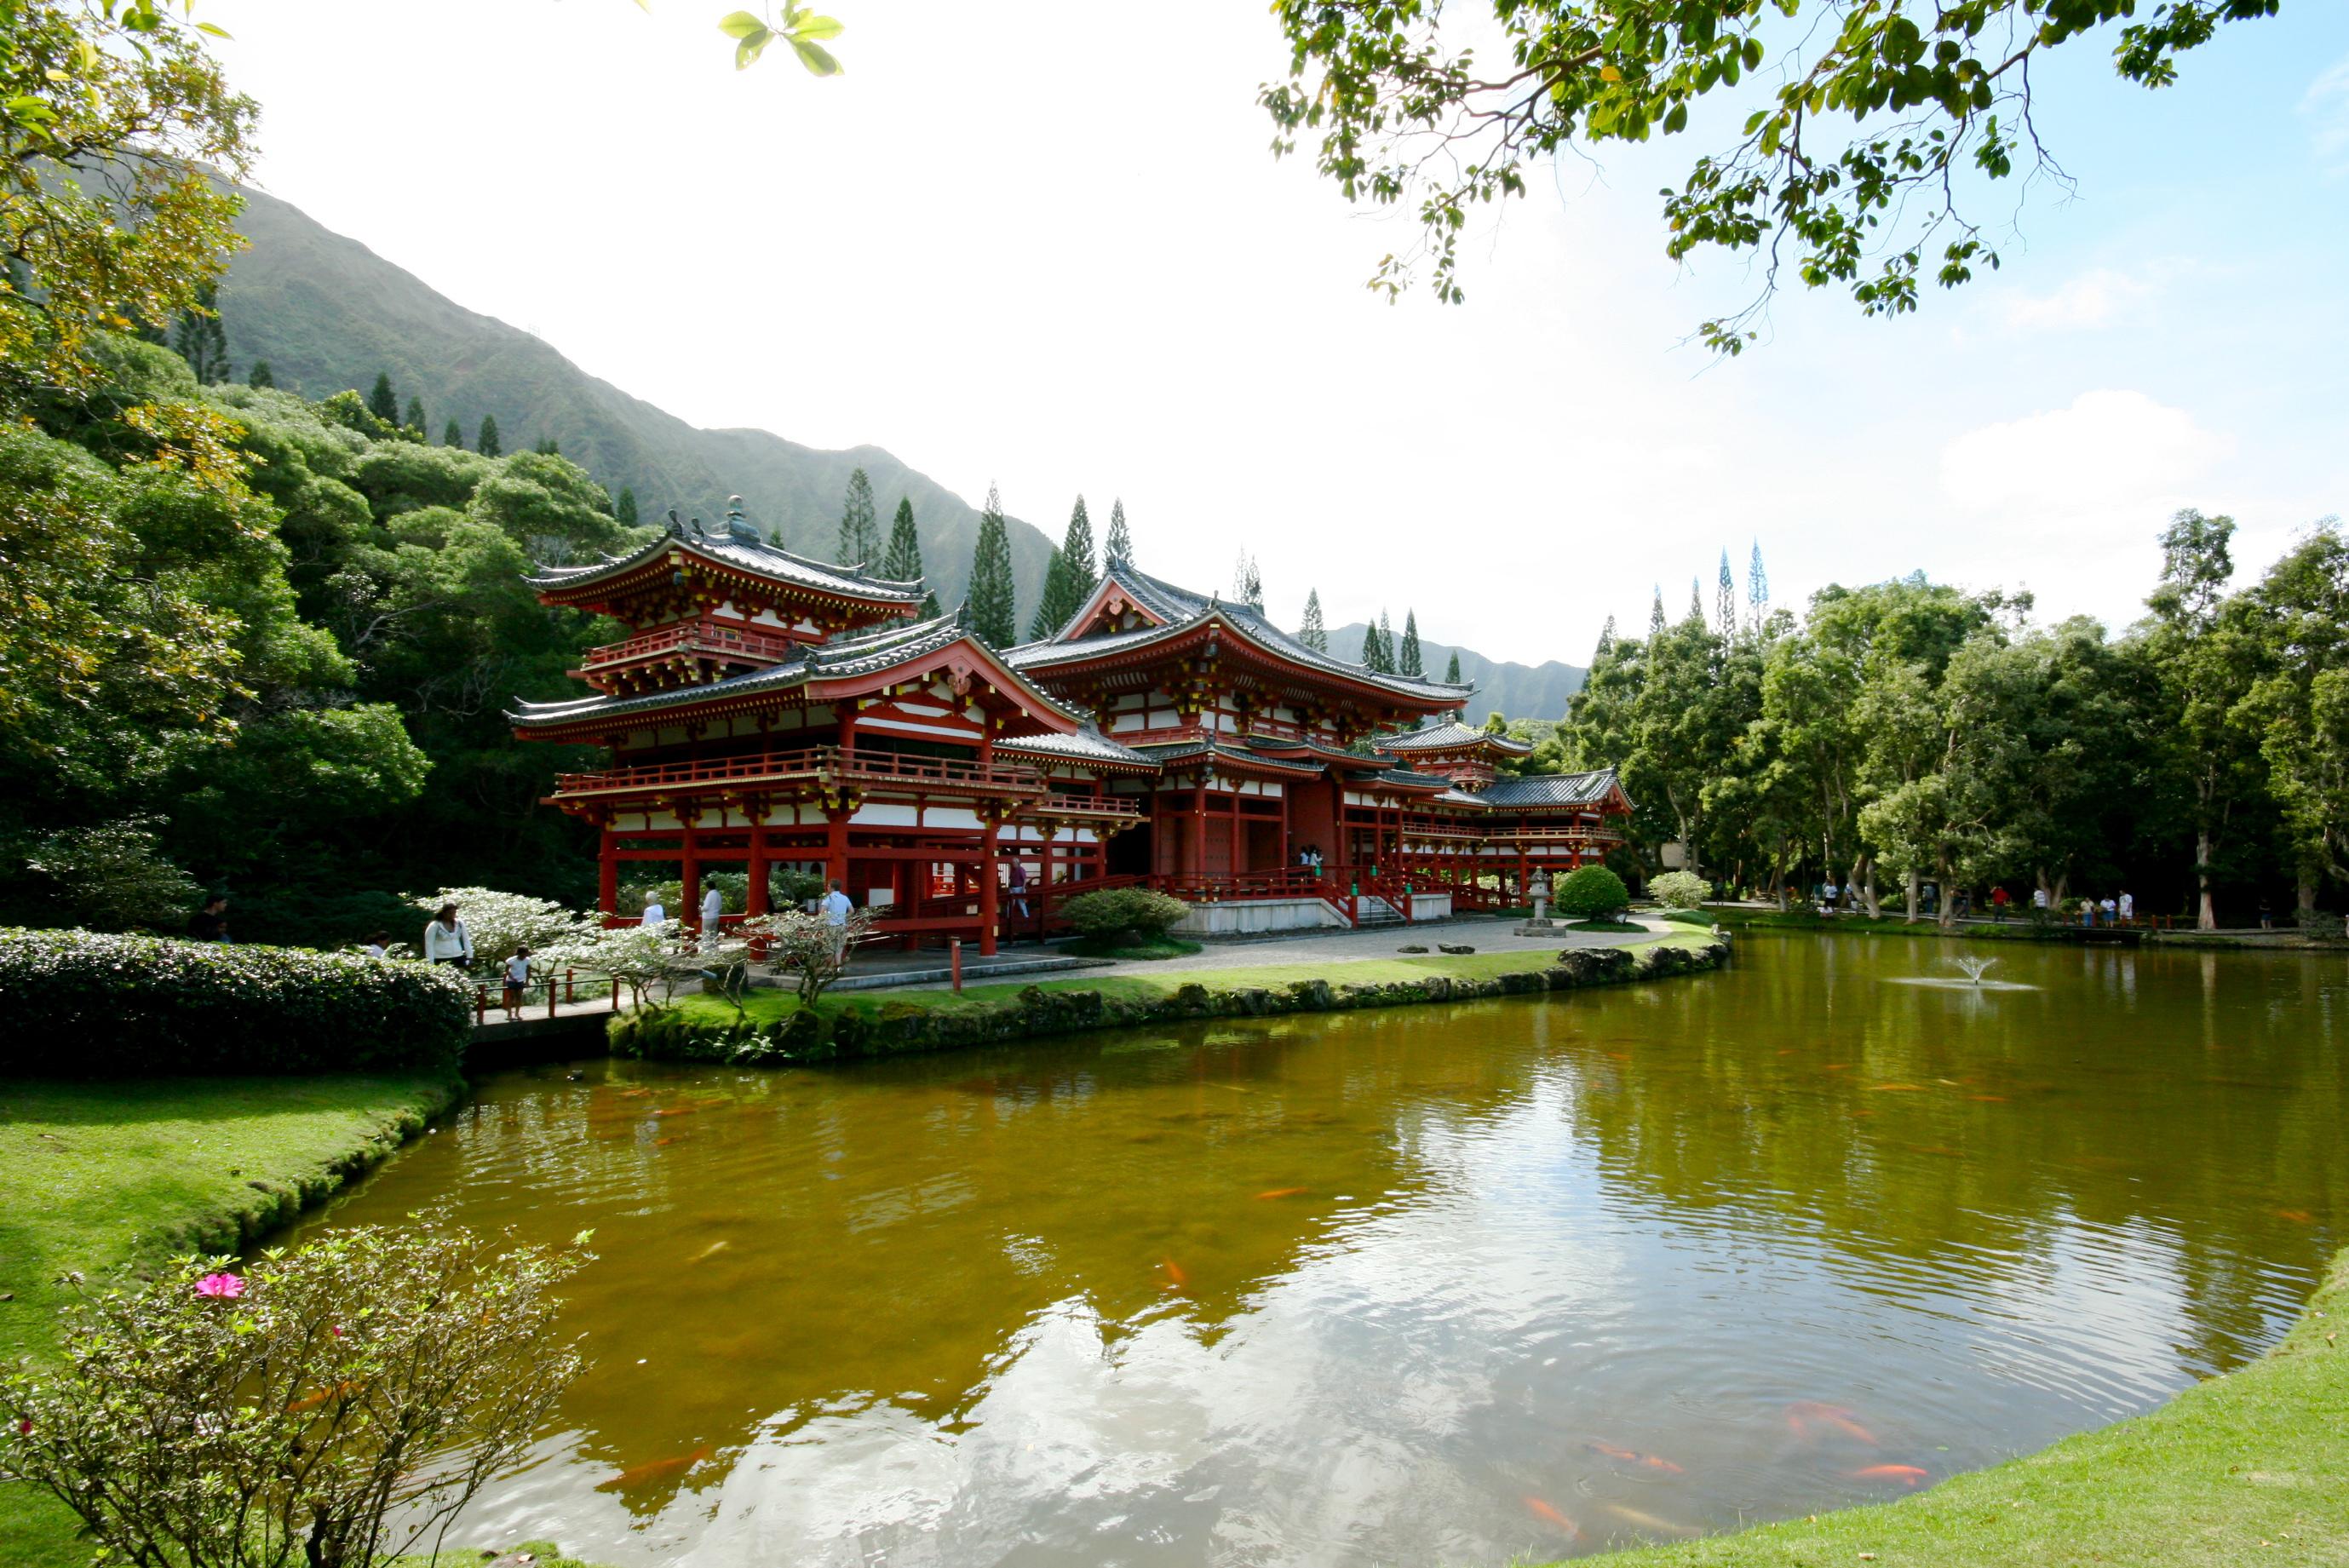 File:Byōdō-in Tempel im Tal der Tempel.jpg - Wikimedia Commons